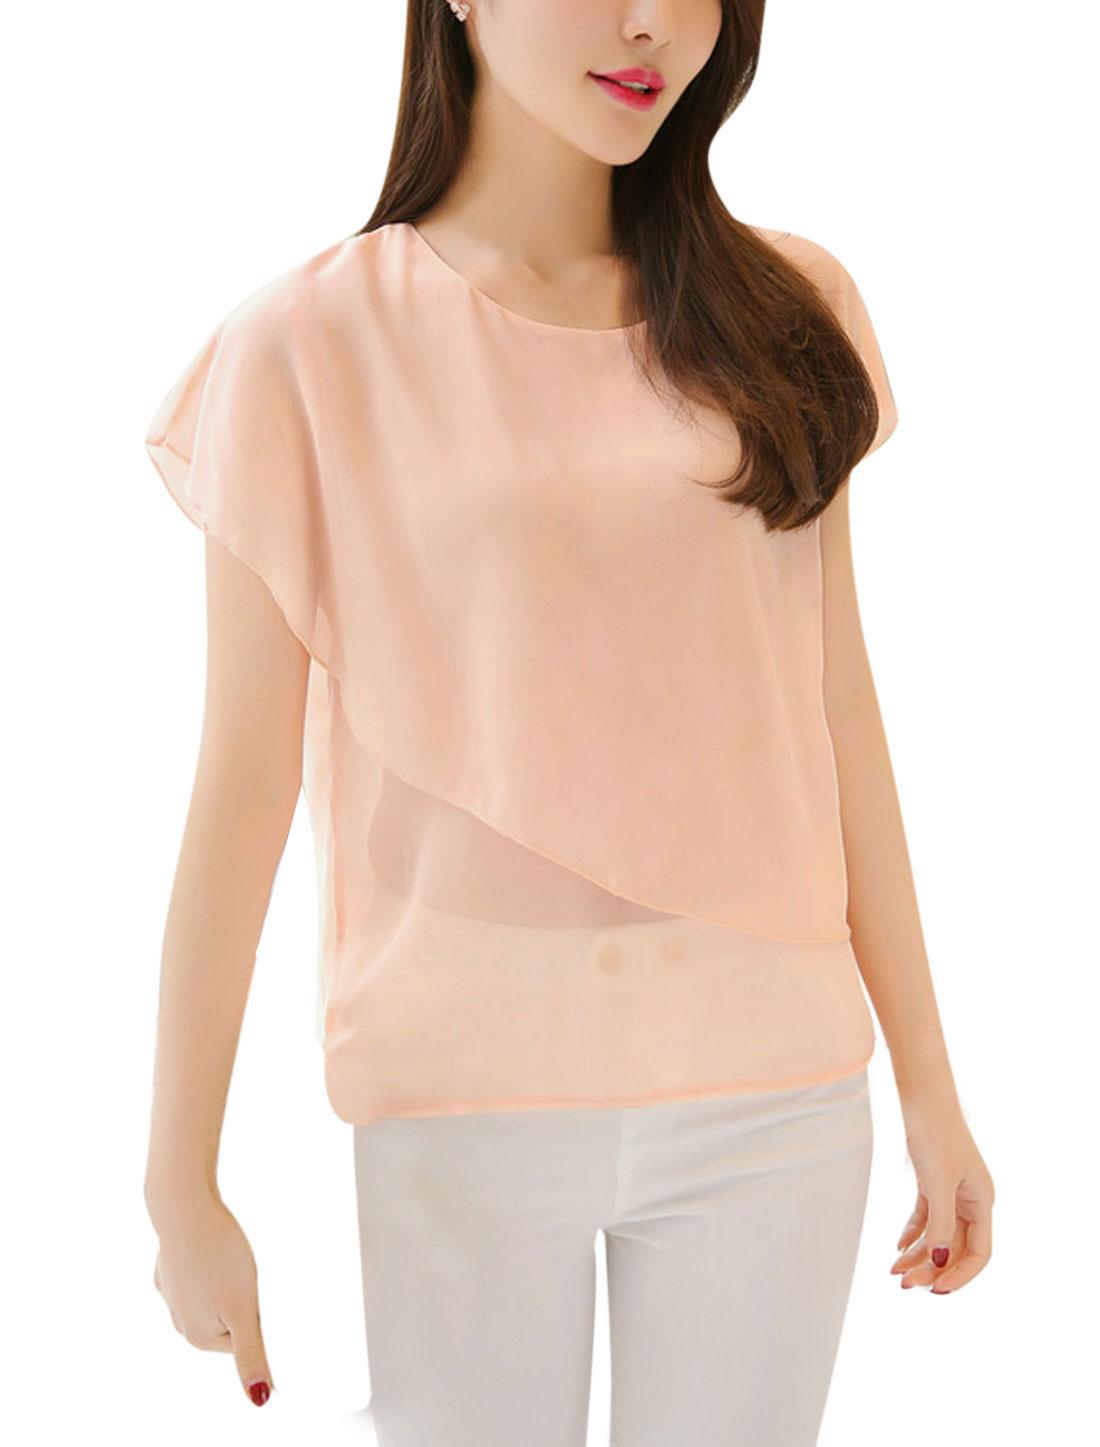 Ladies Round Neck Short Sleeves Overlay Chiffon Shirts Pale Pink M